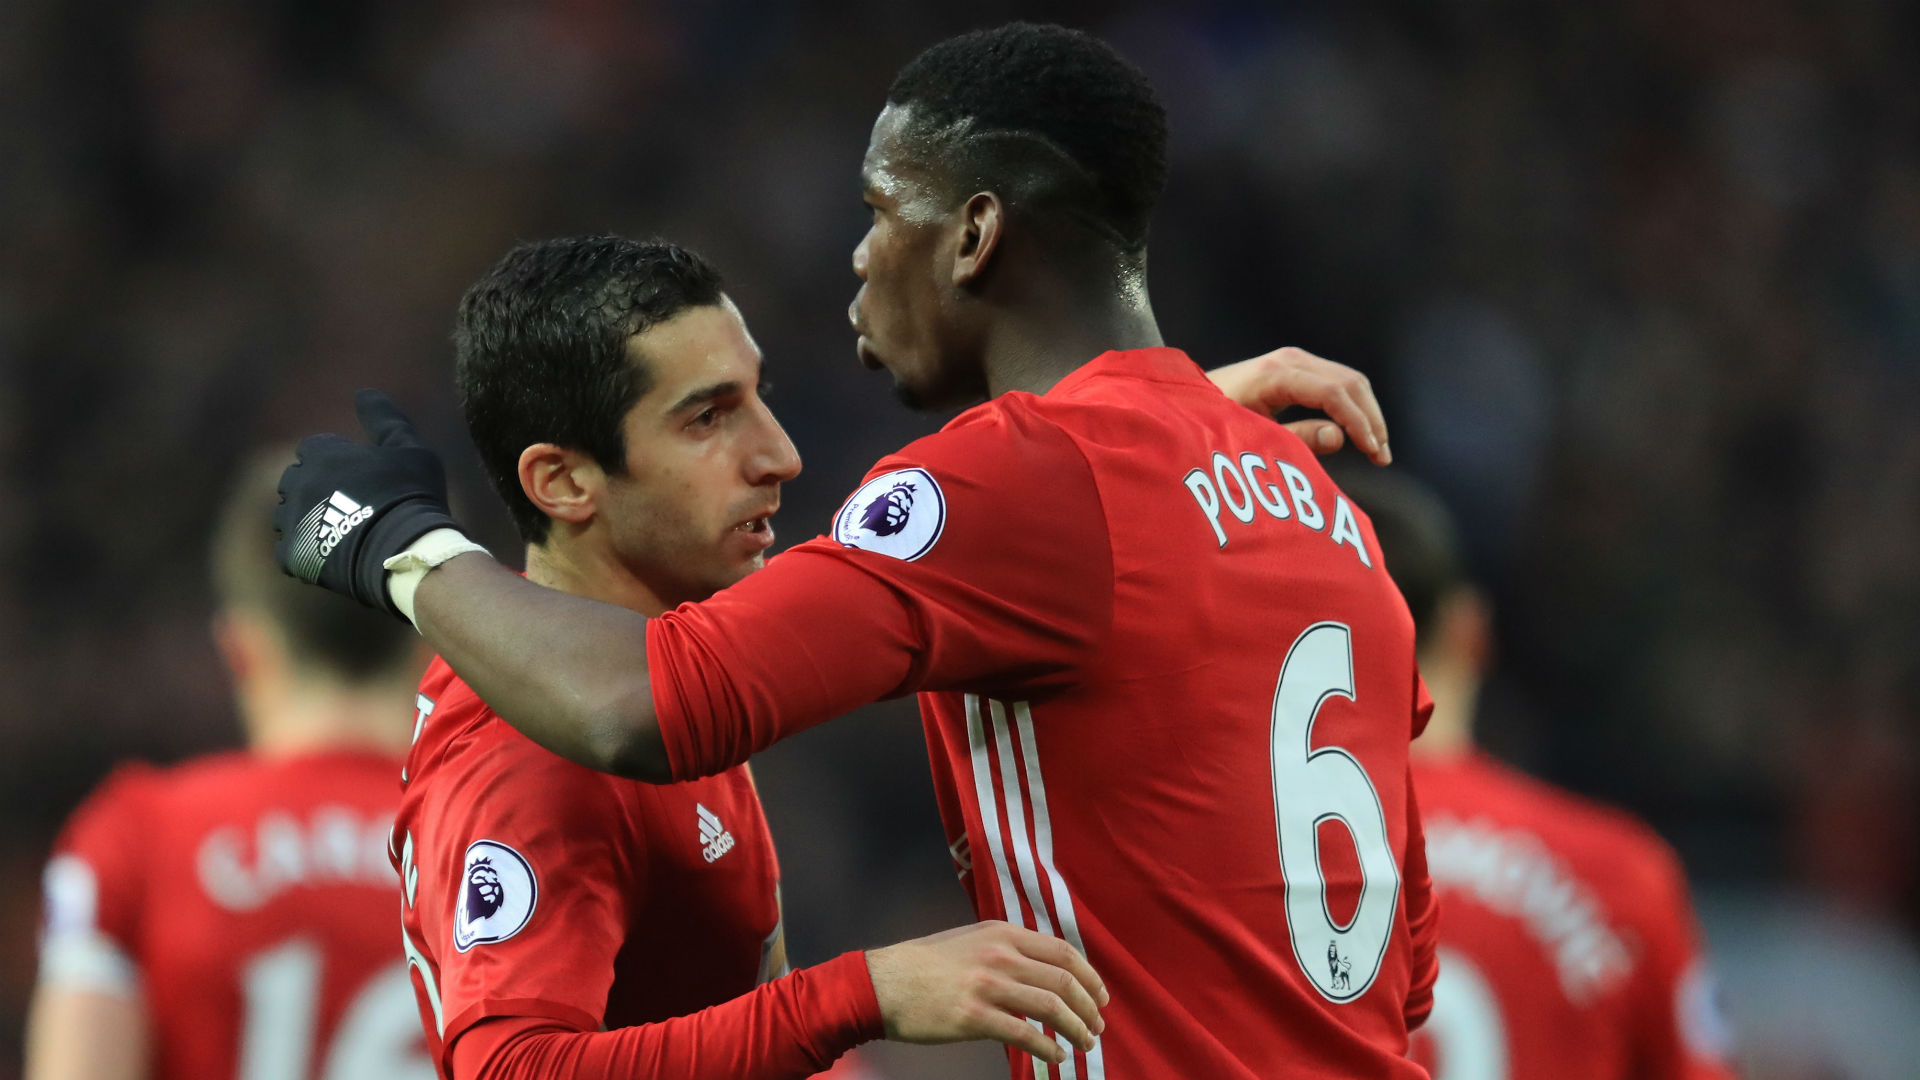 Henrikh Mkhitaryan Paul Pogba Manchester United